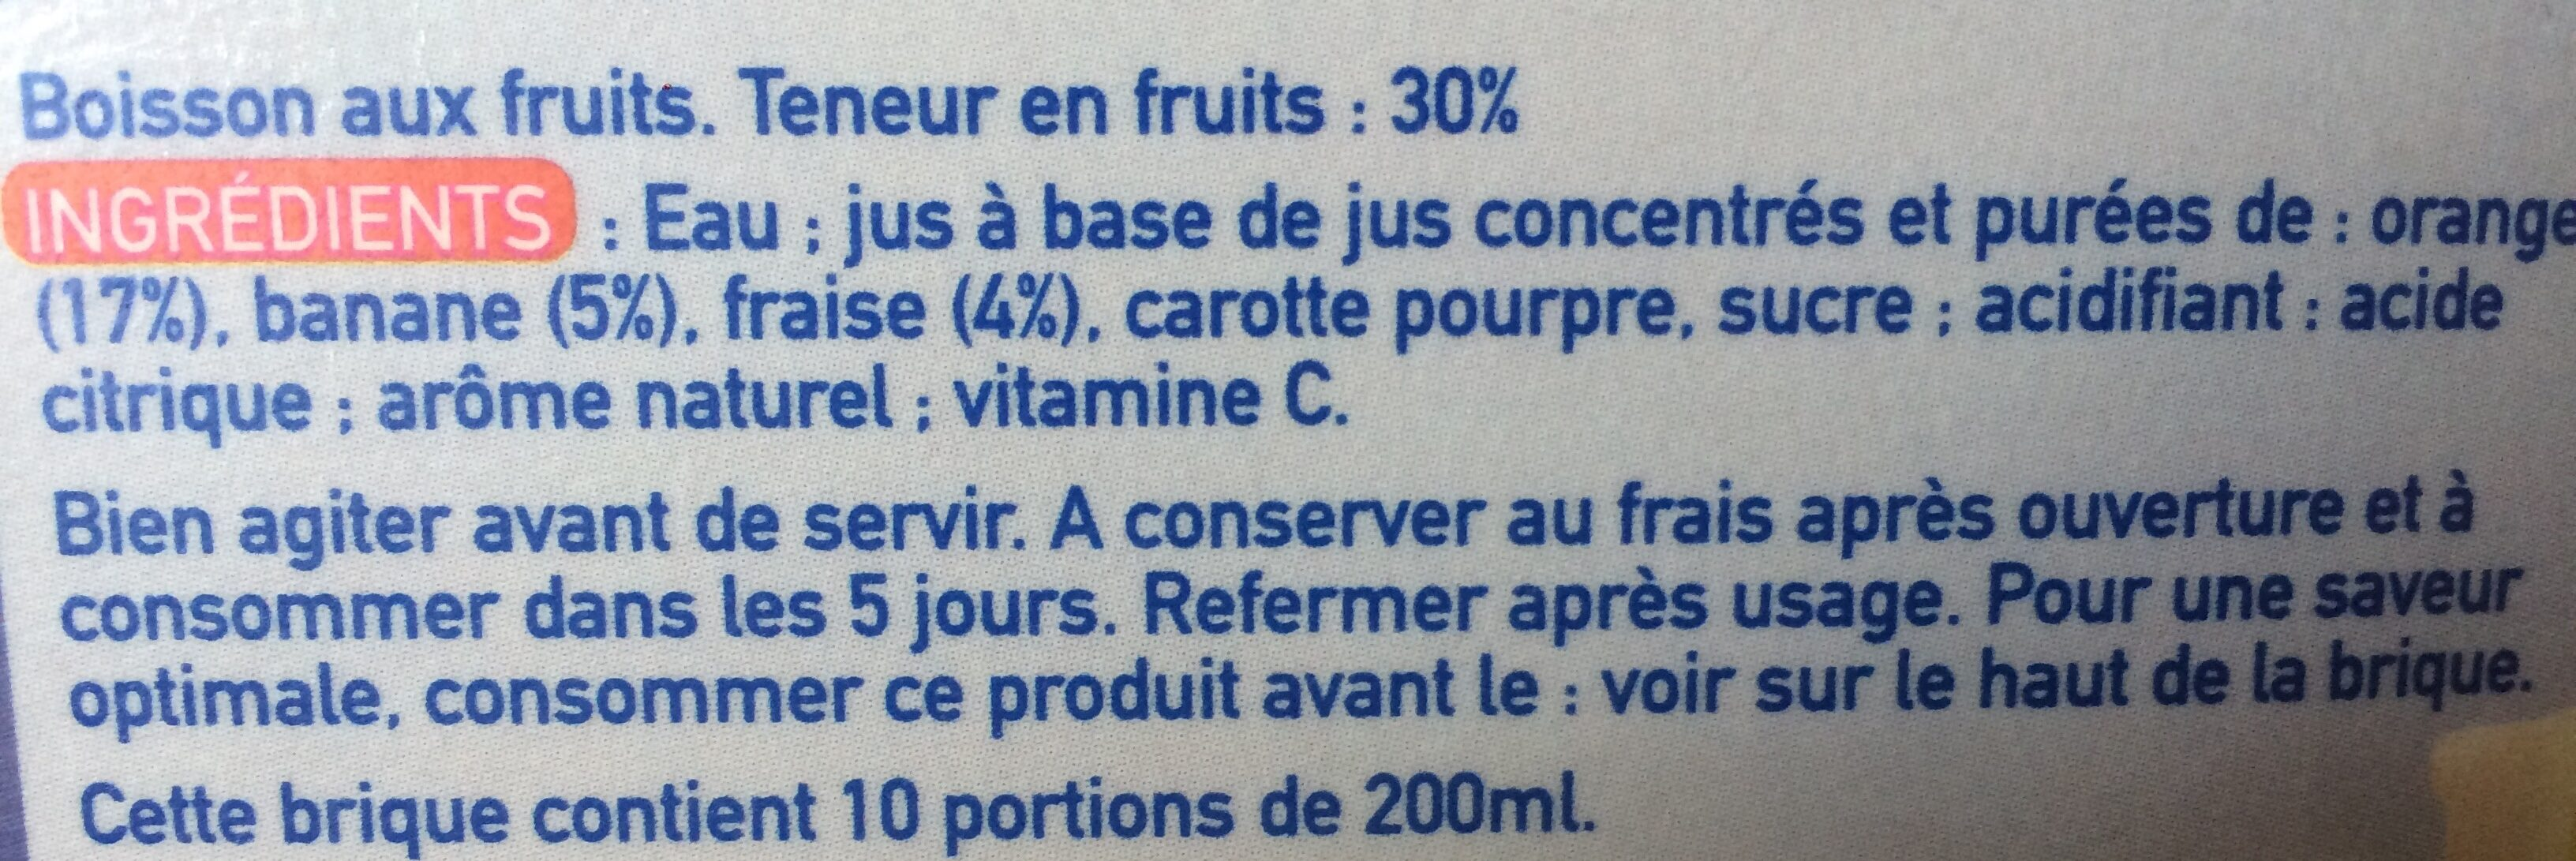 Rea orange banane cerise - Ingrédients